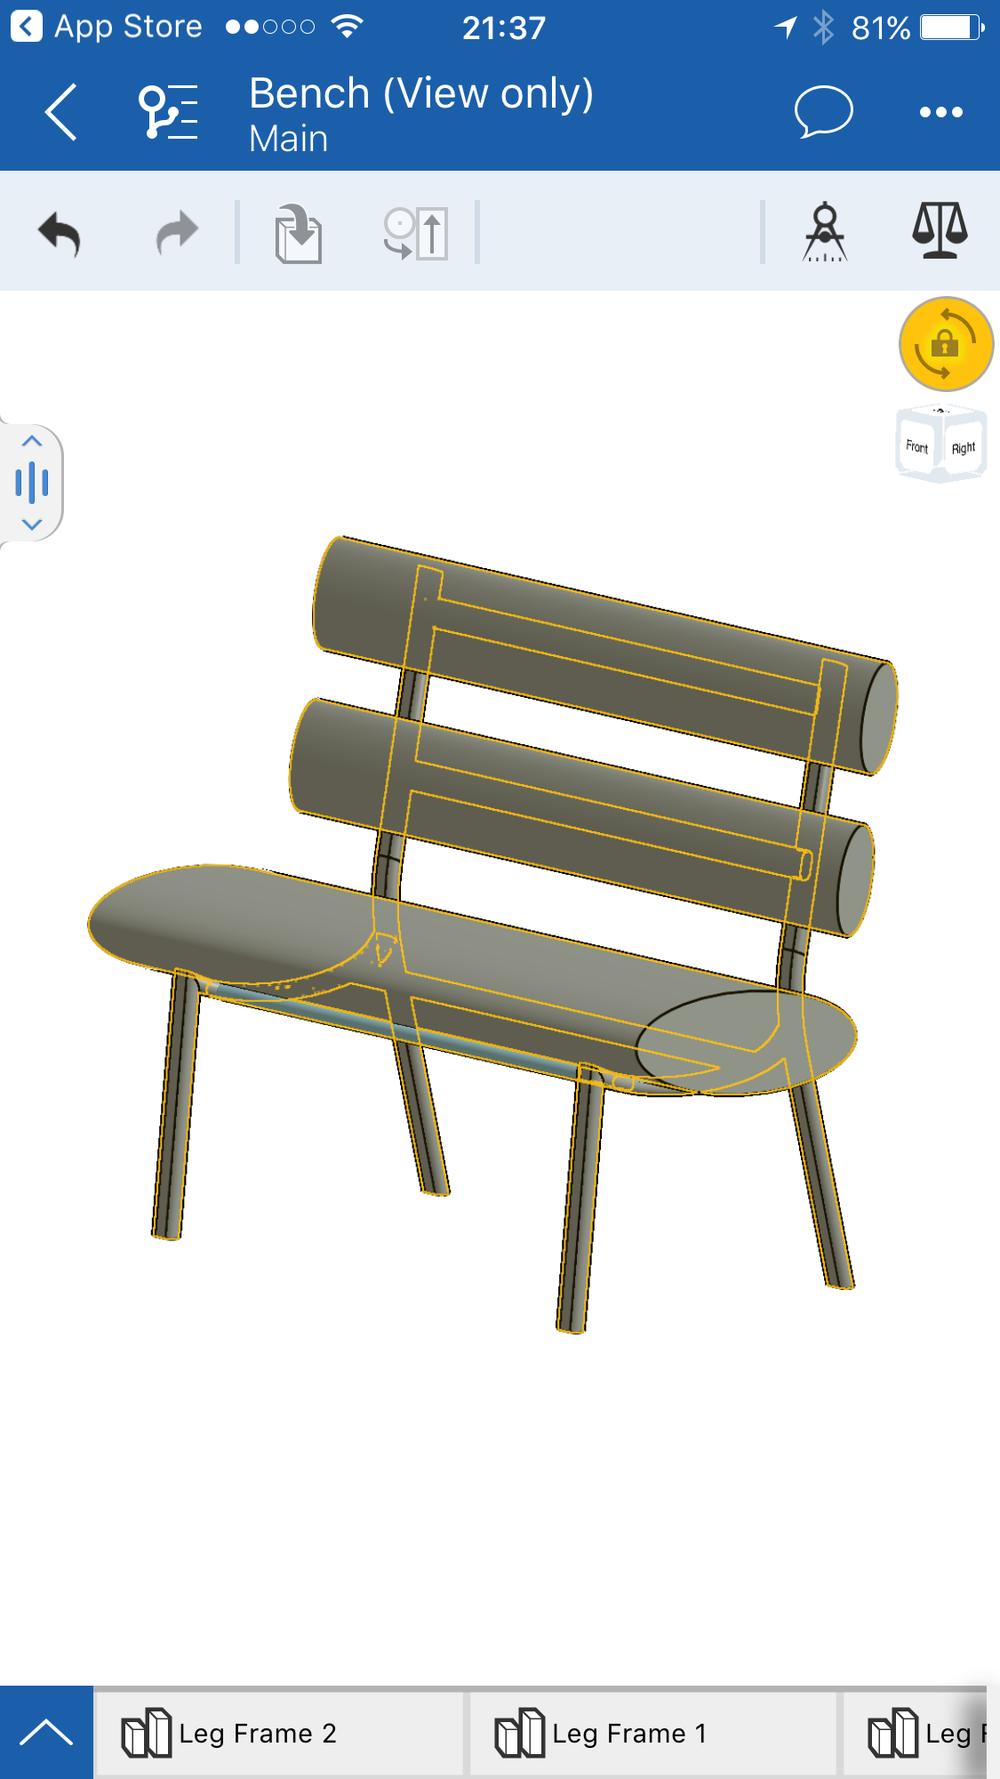 3D Cad model of metal frame and upholstered bench.